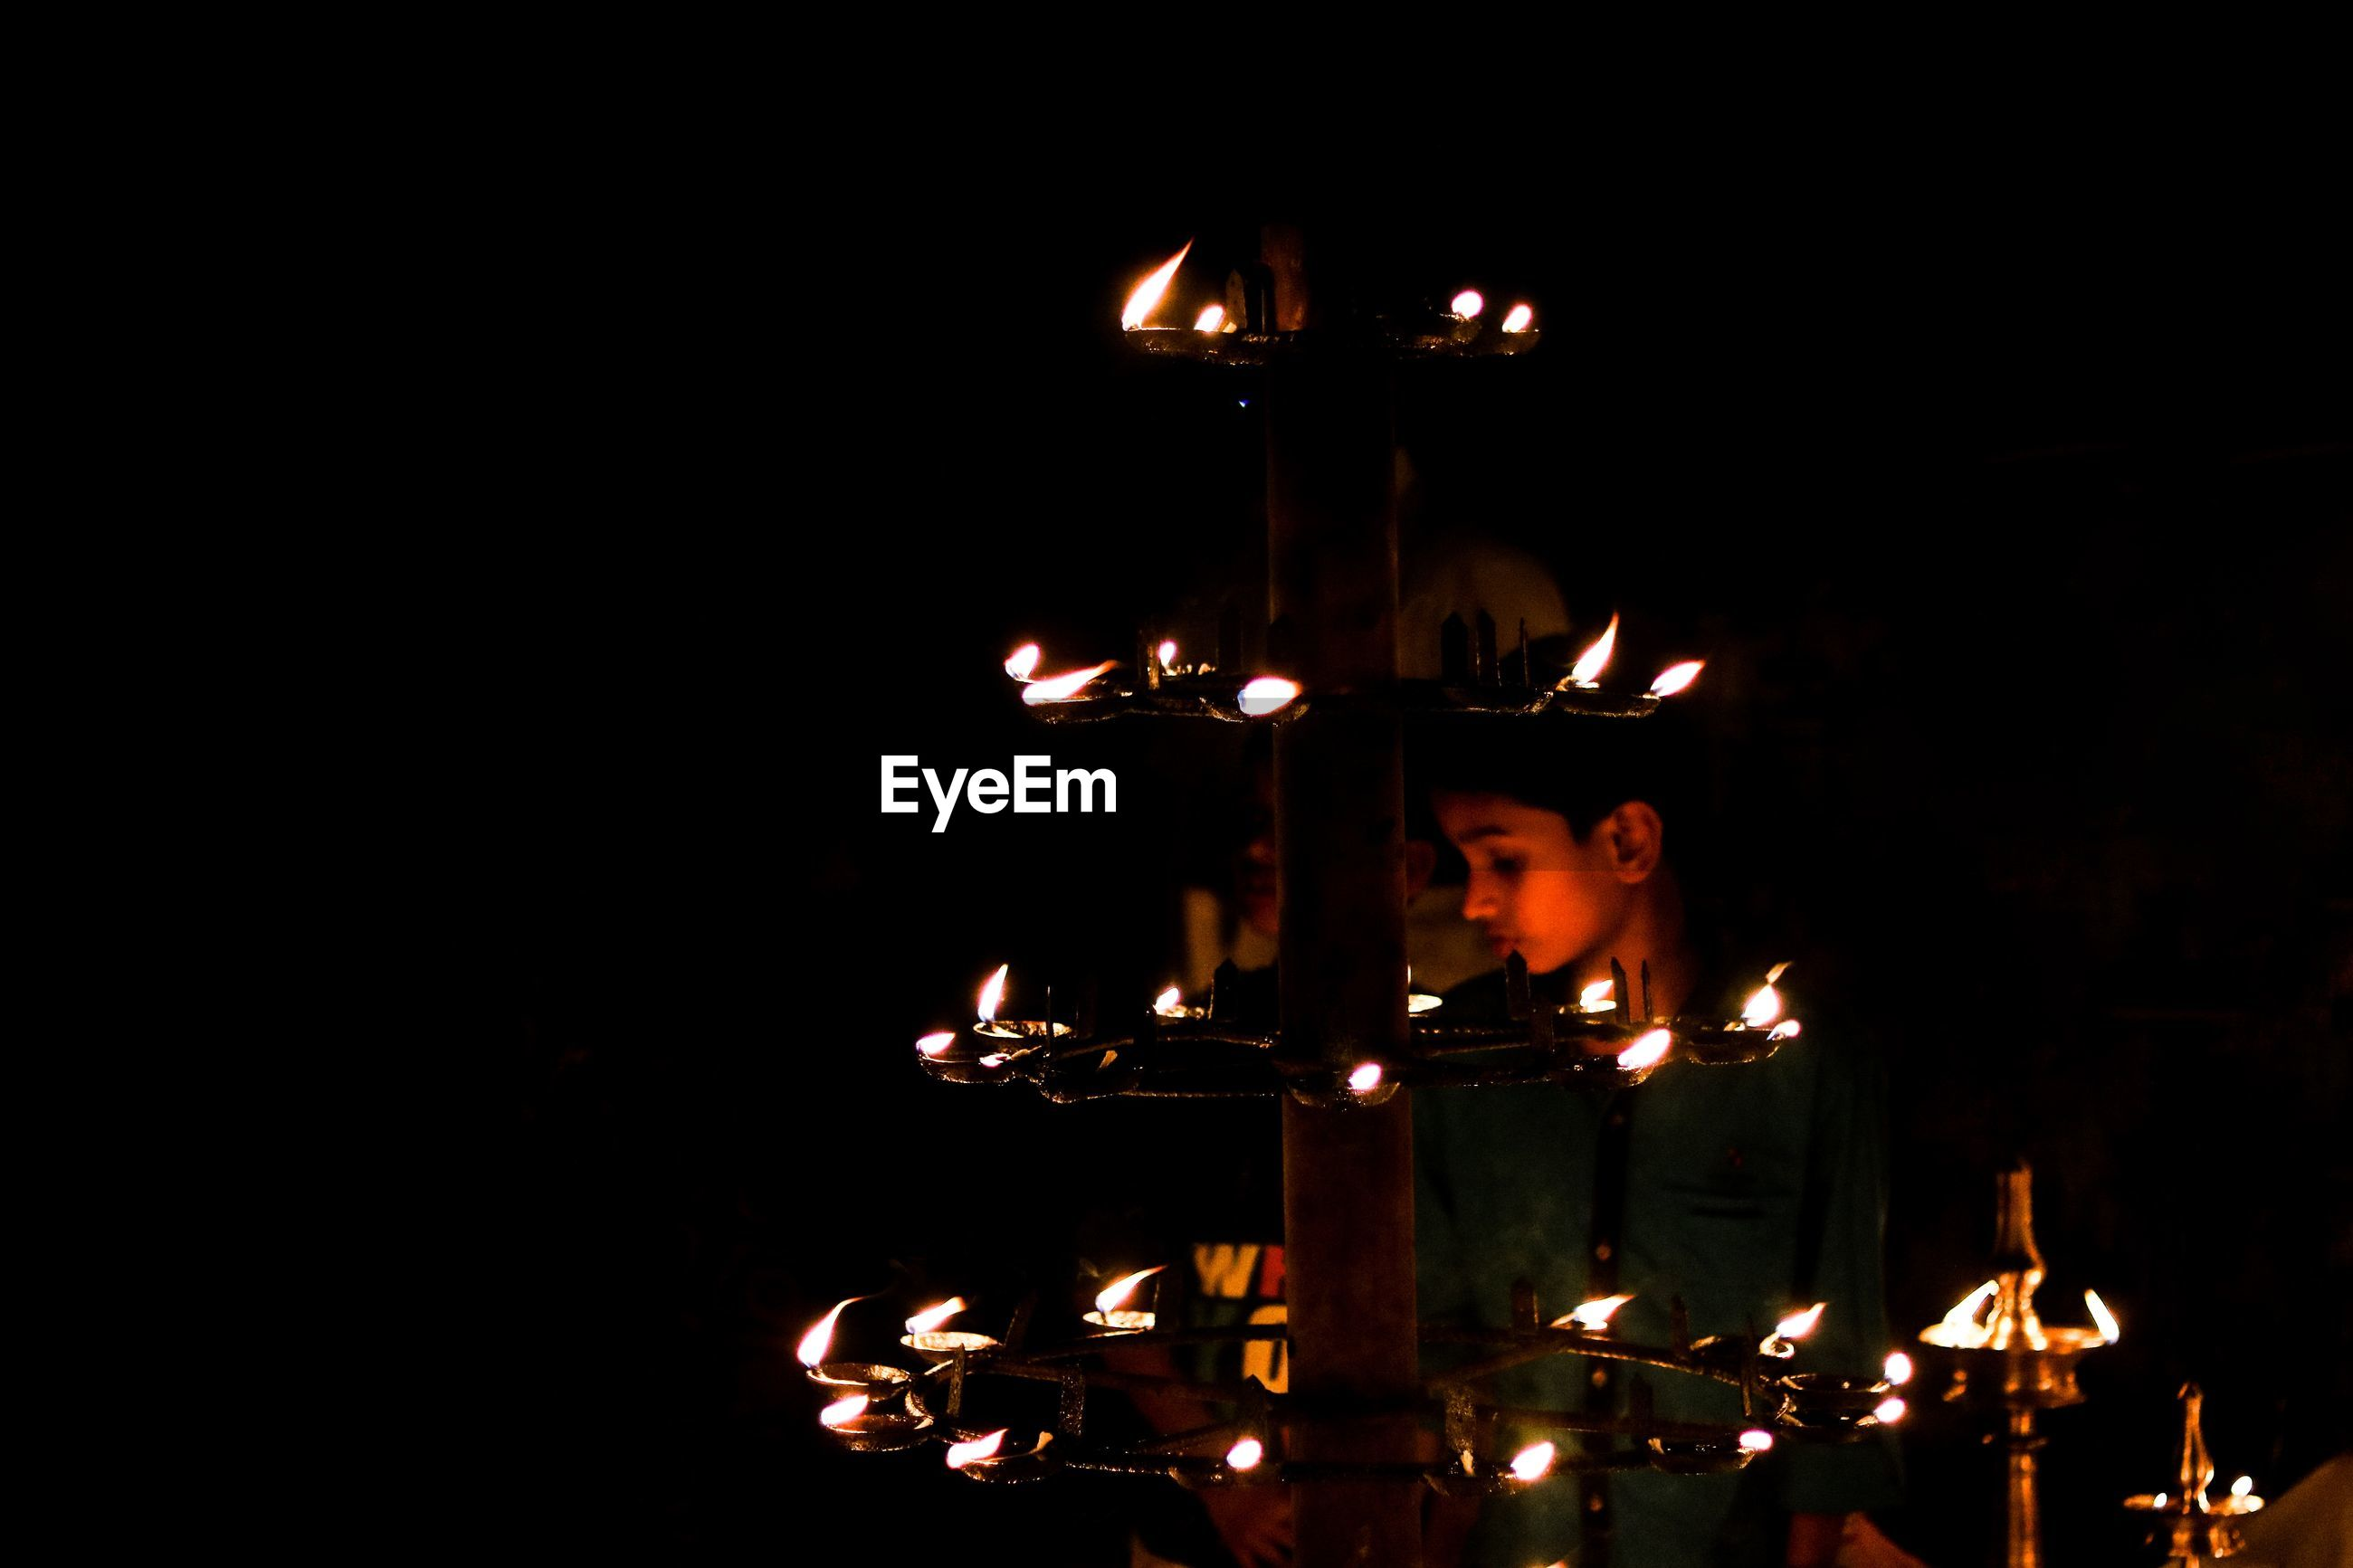 Boy standing by illuminated diyas at night